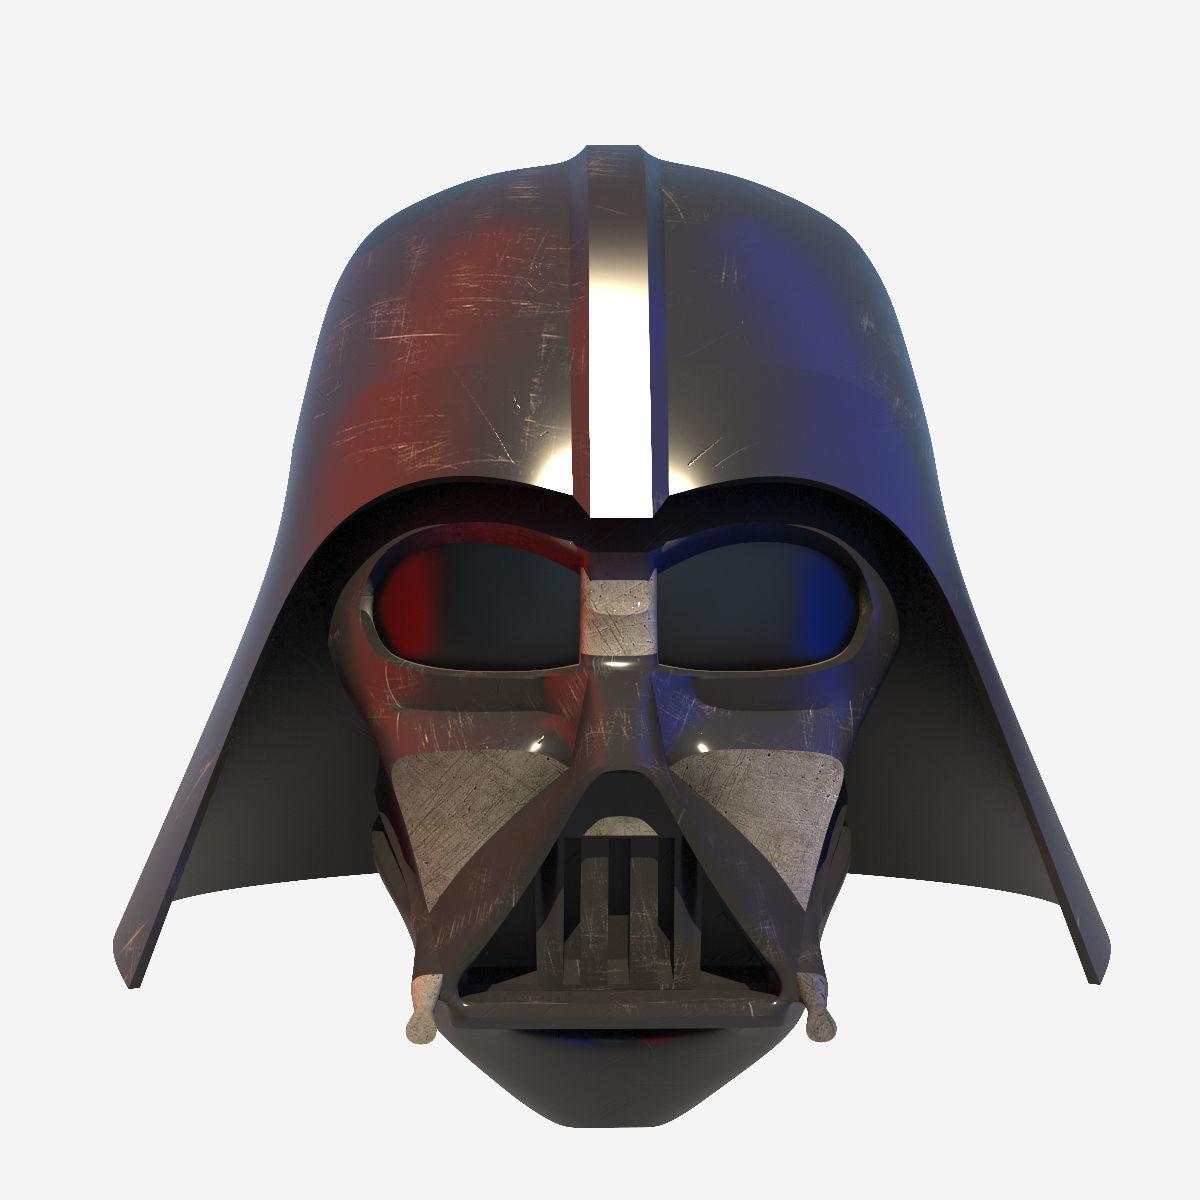 Darth Vader Helmet 3ds Max American Bathtub Refinishers